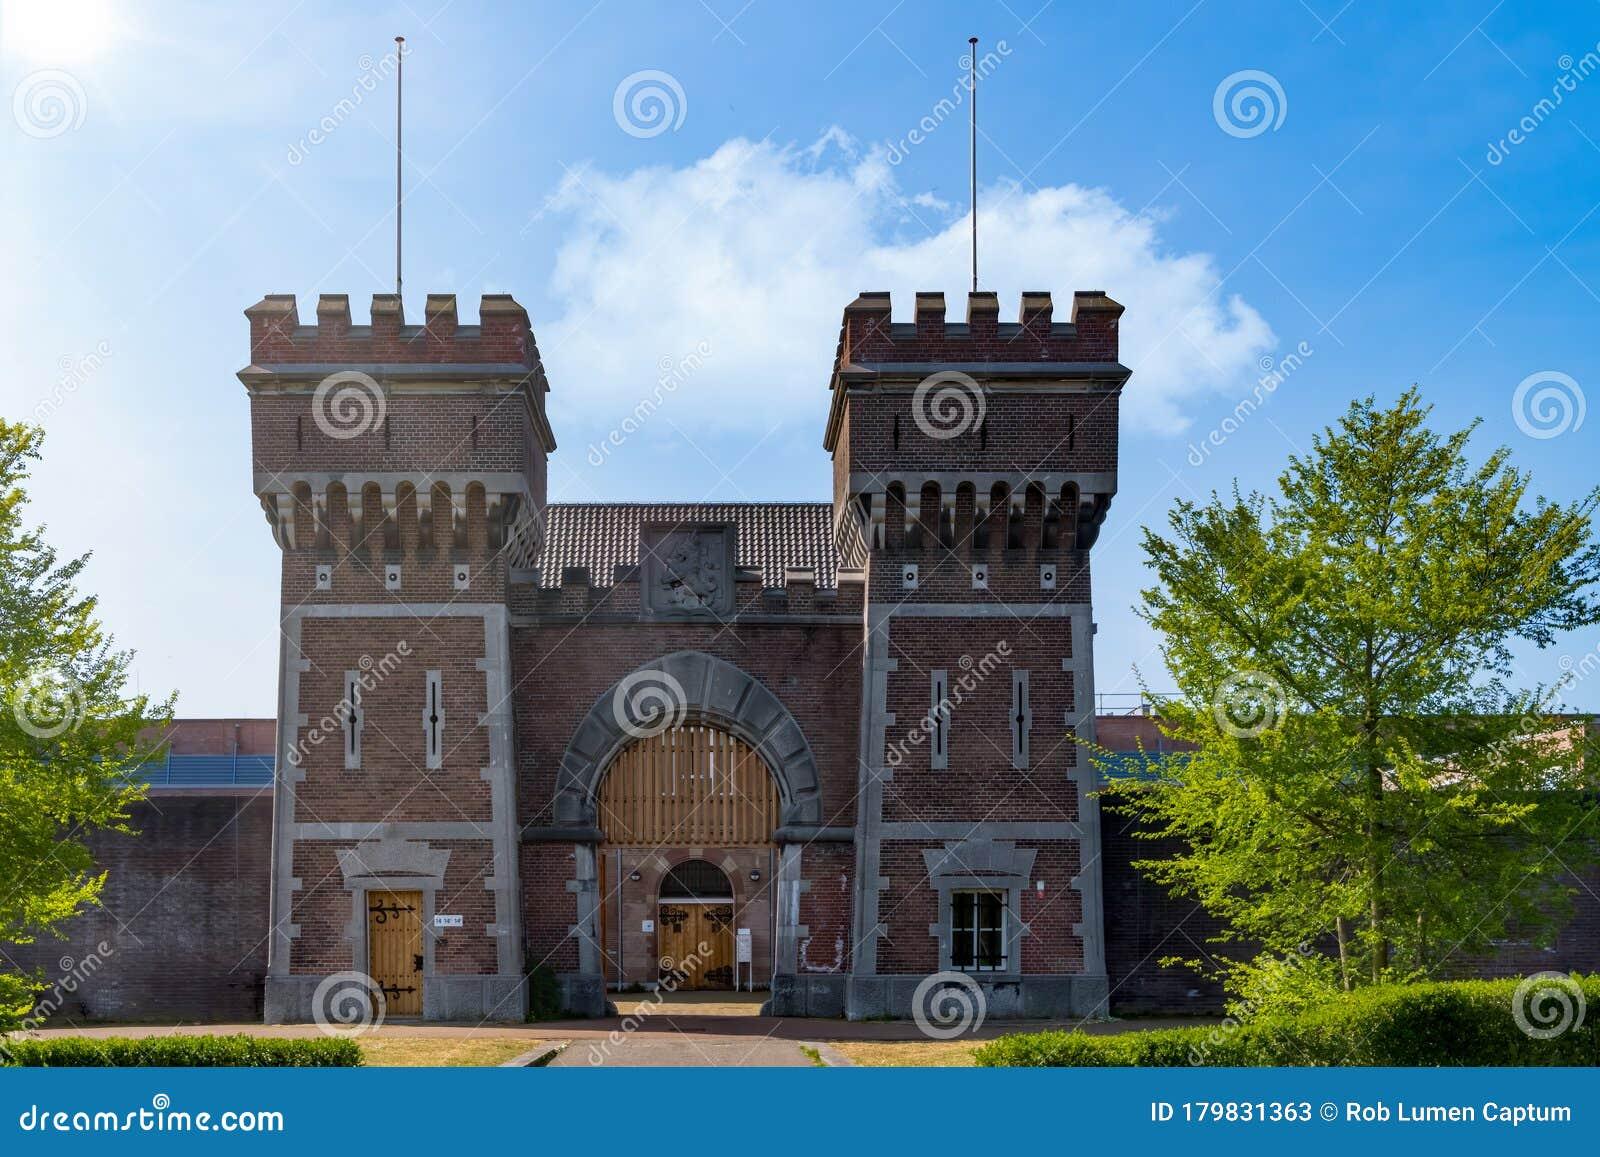 Prison Hague Penitentiary Institution In Scheveningen, The Hague,  Netherlands Stock Image - Image of iconic, institution: 179831363